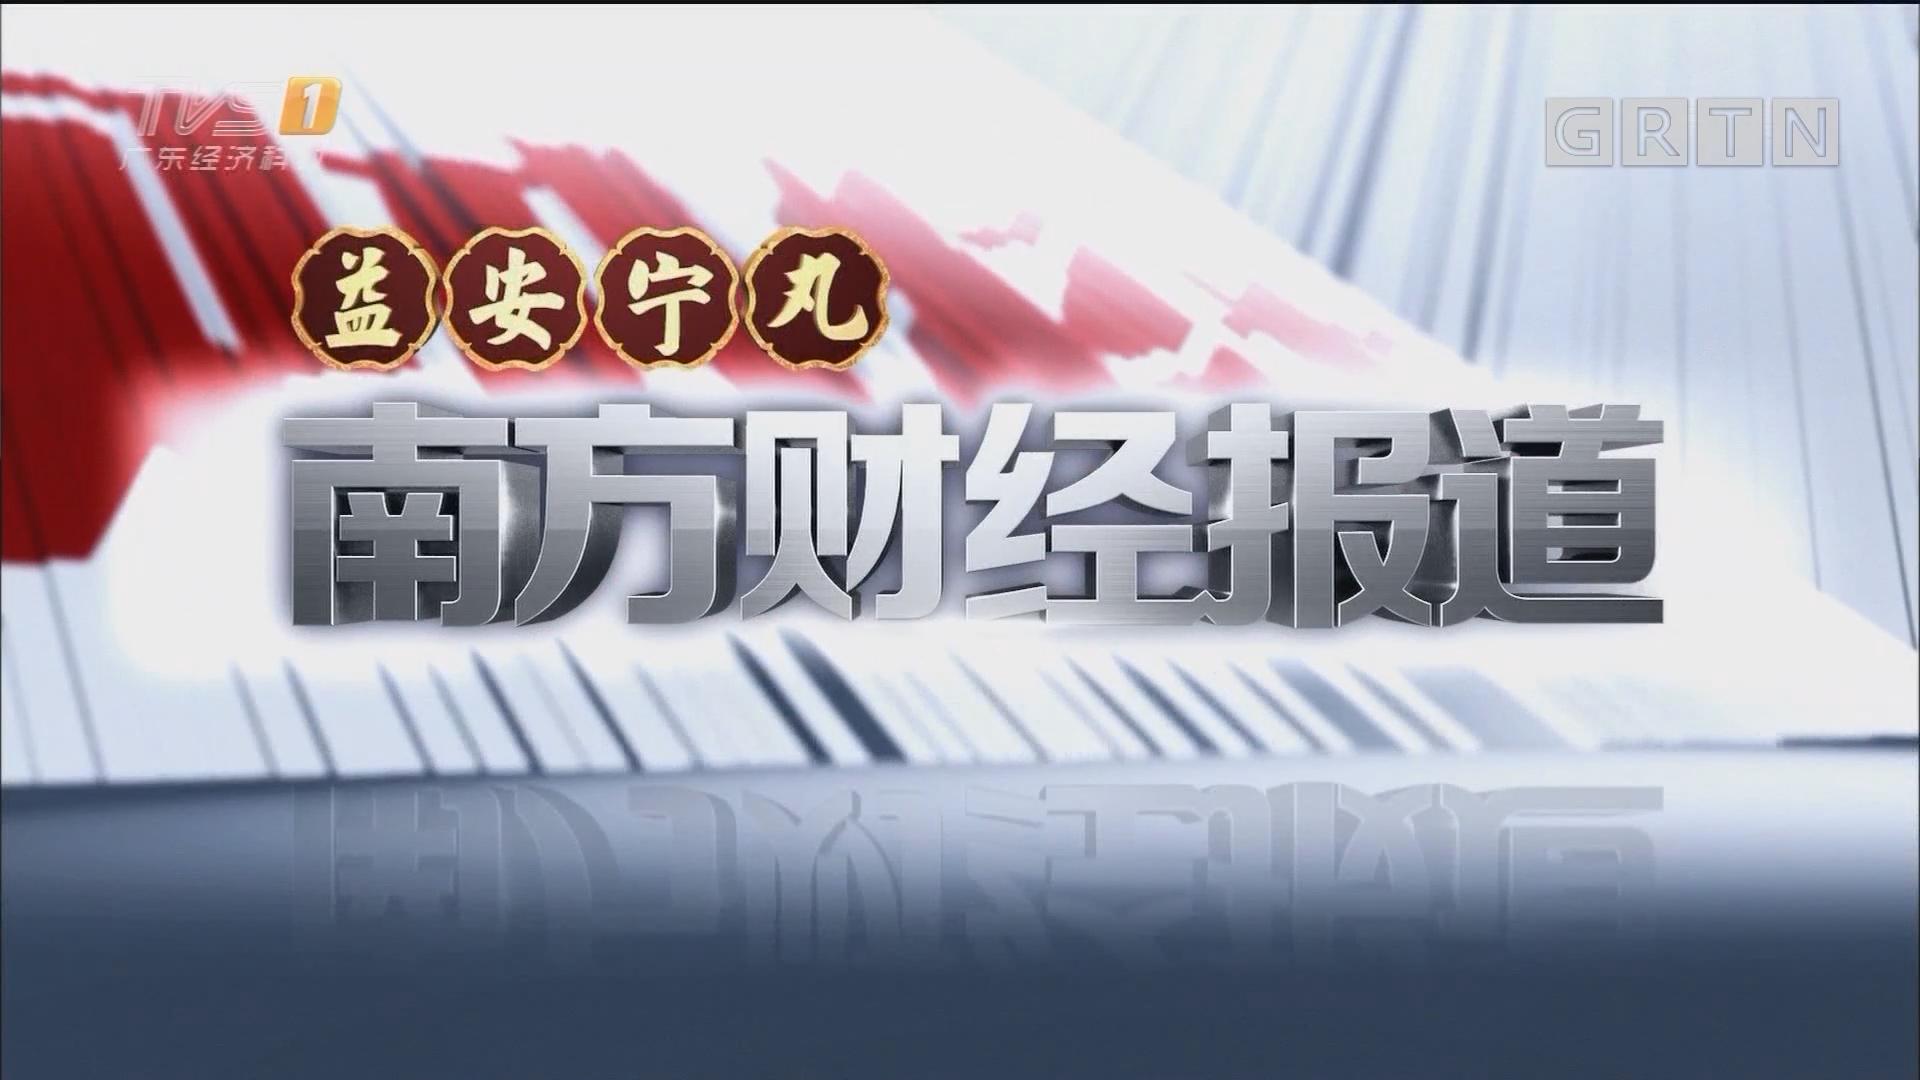 [HD][2019-05-16]南方财经报道:习近平在亚洲文明对话大会上主旨演讲引发热议